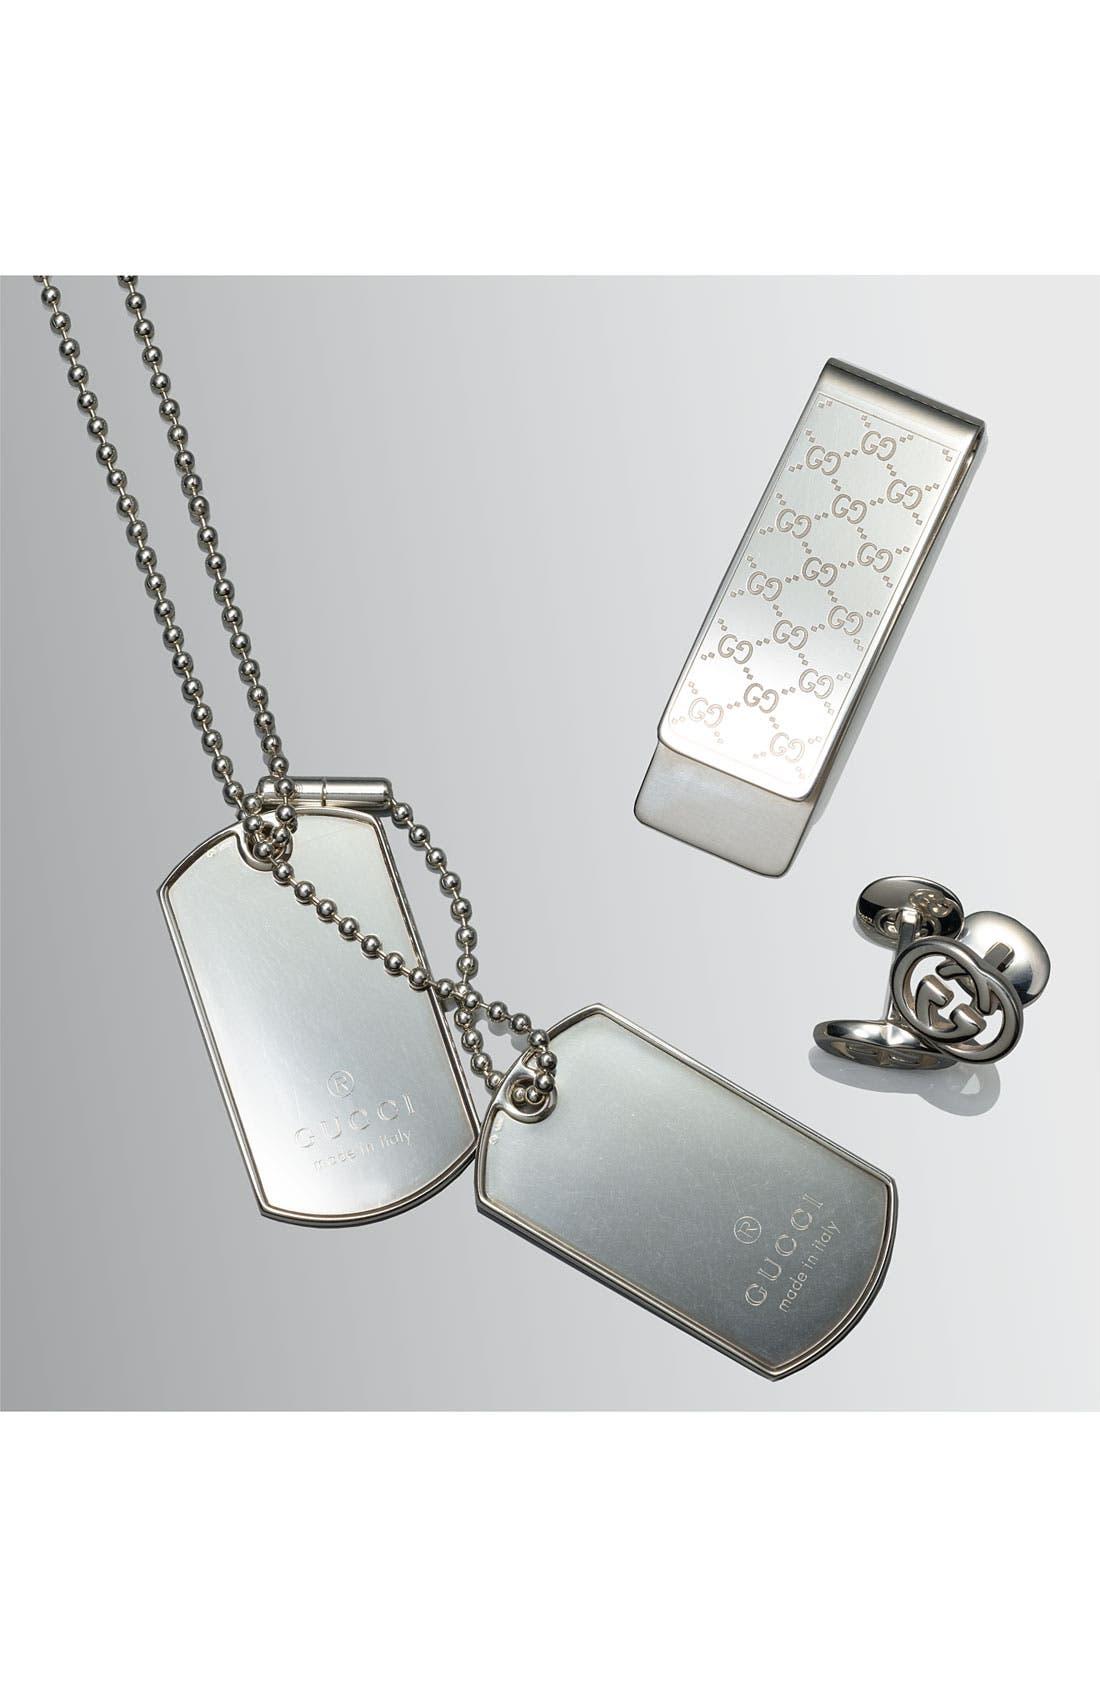 'Silver Britt' Cuff Links,                             Alternate thumbnail 3, color,                             040